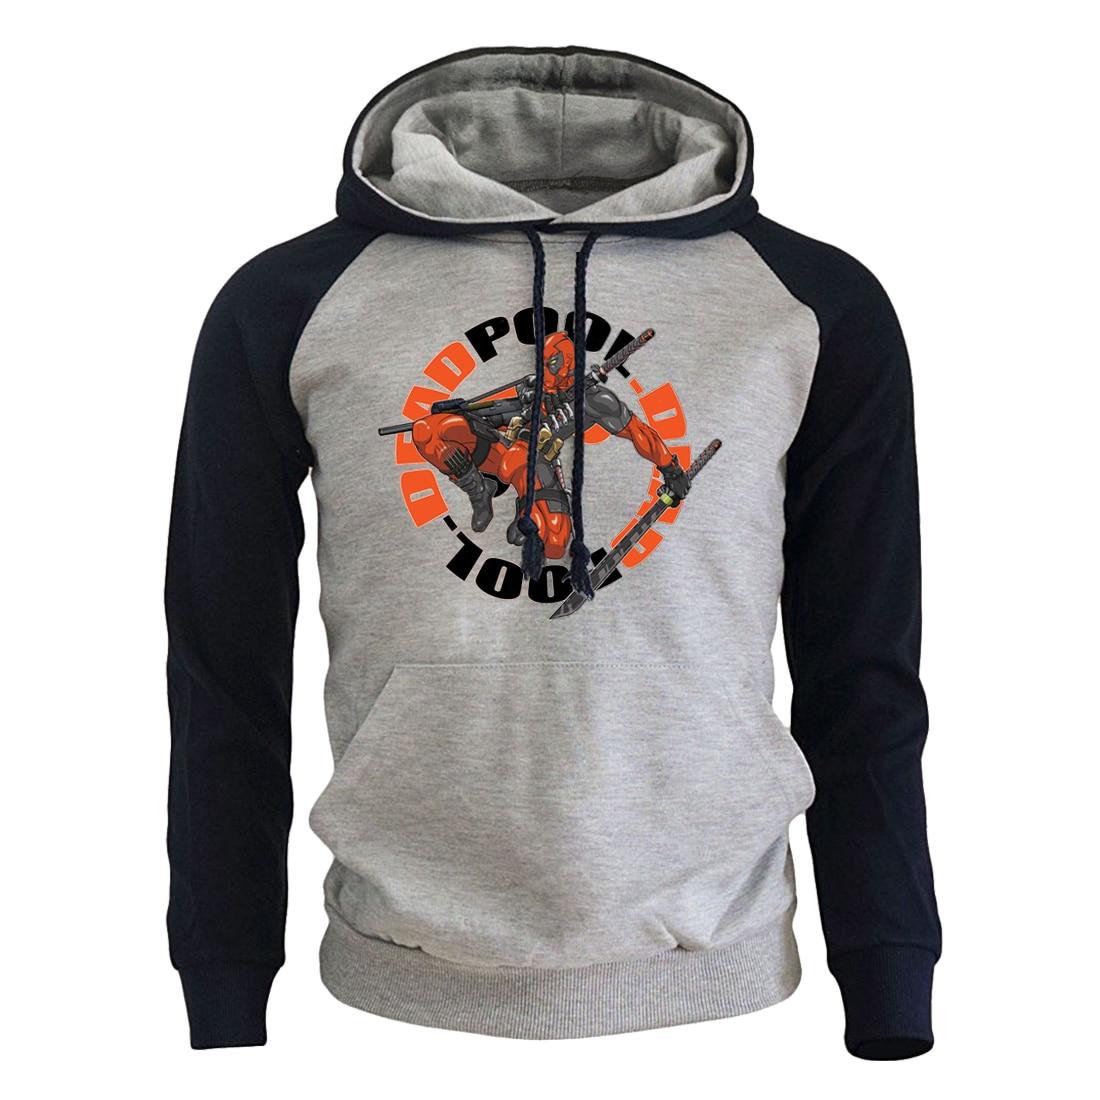 Deadpool Sweatshirts For Men Spring Coats 2019 New Brand Clothing Hoody Streetwear Men's Sweatshirt Movie Harajuku Hoodies Male